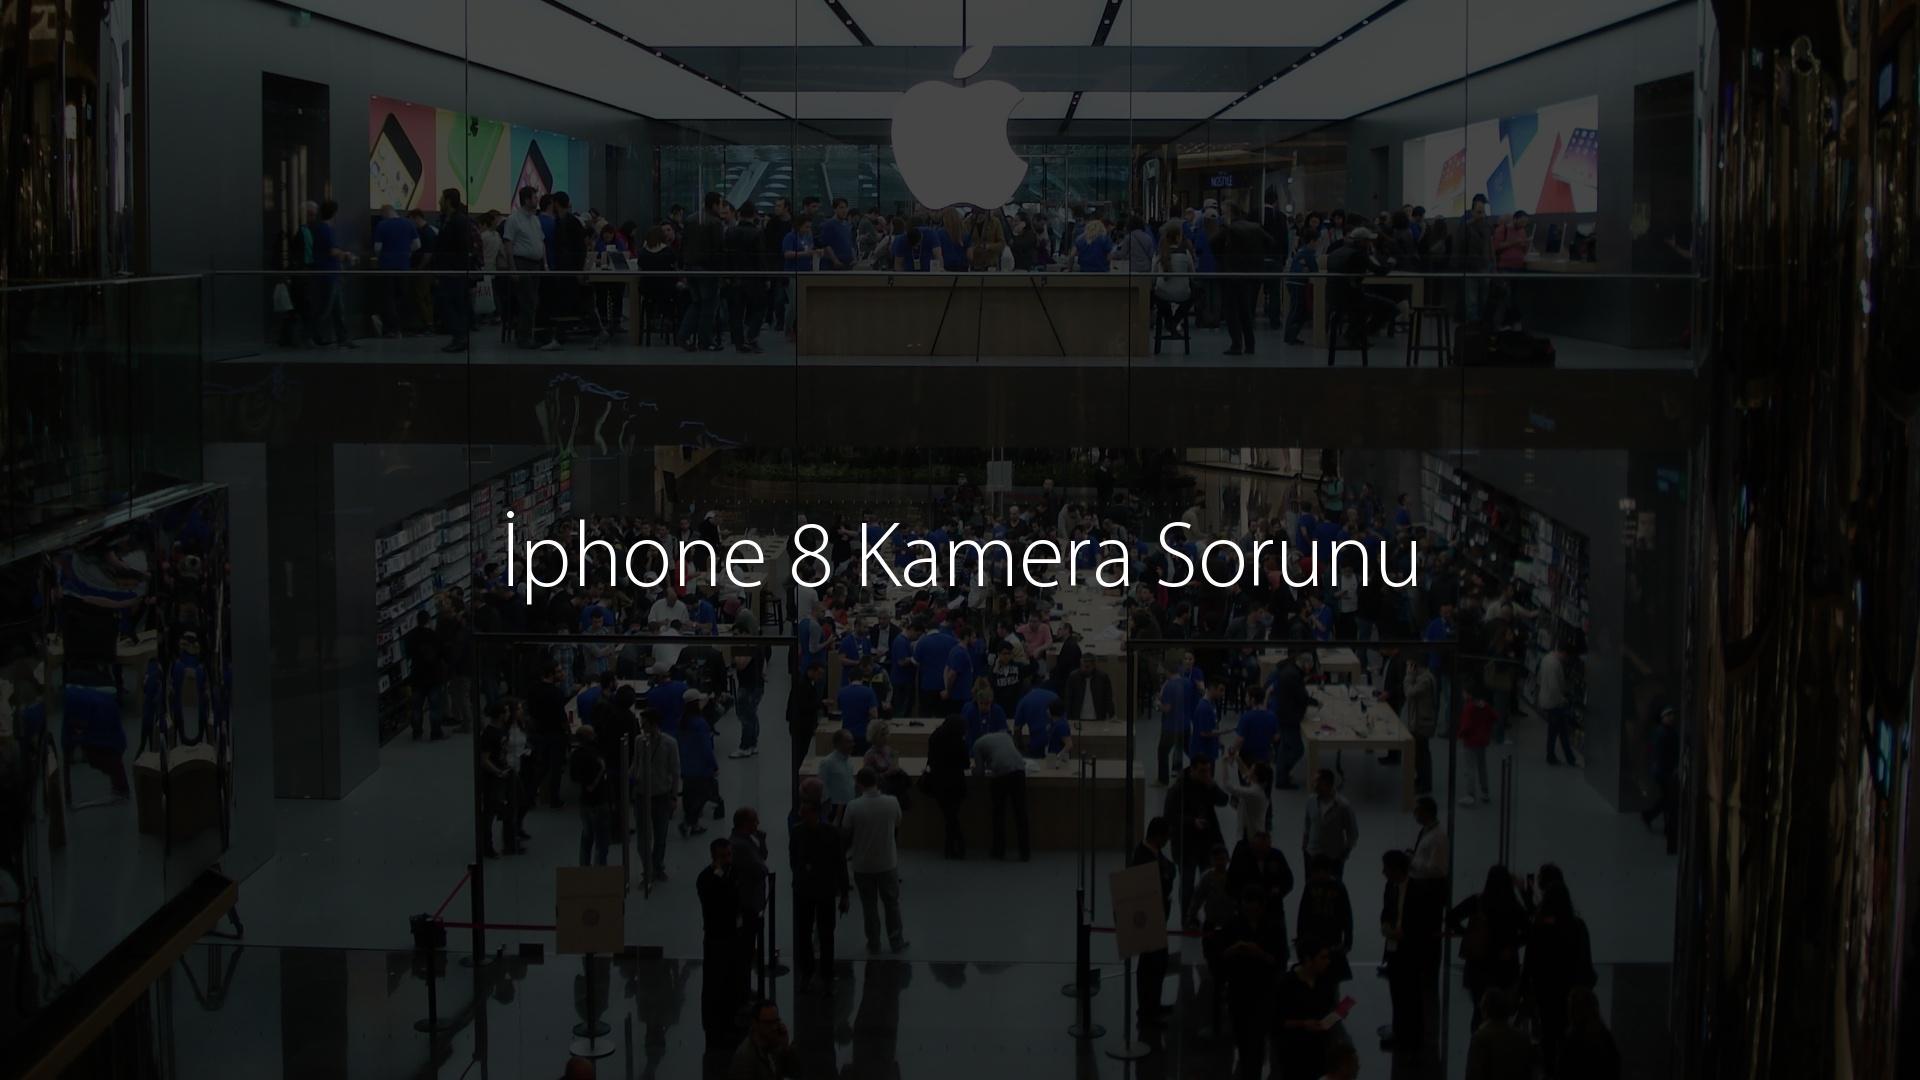 İphone 8 Kamera Sorunu